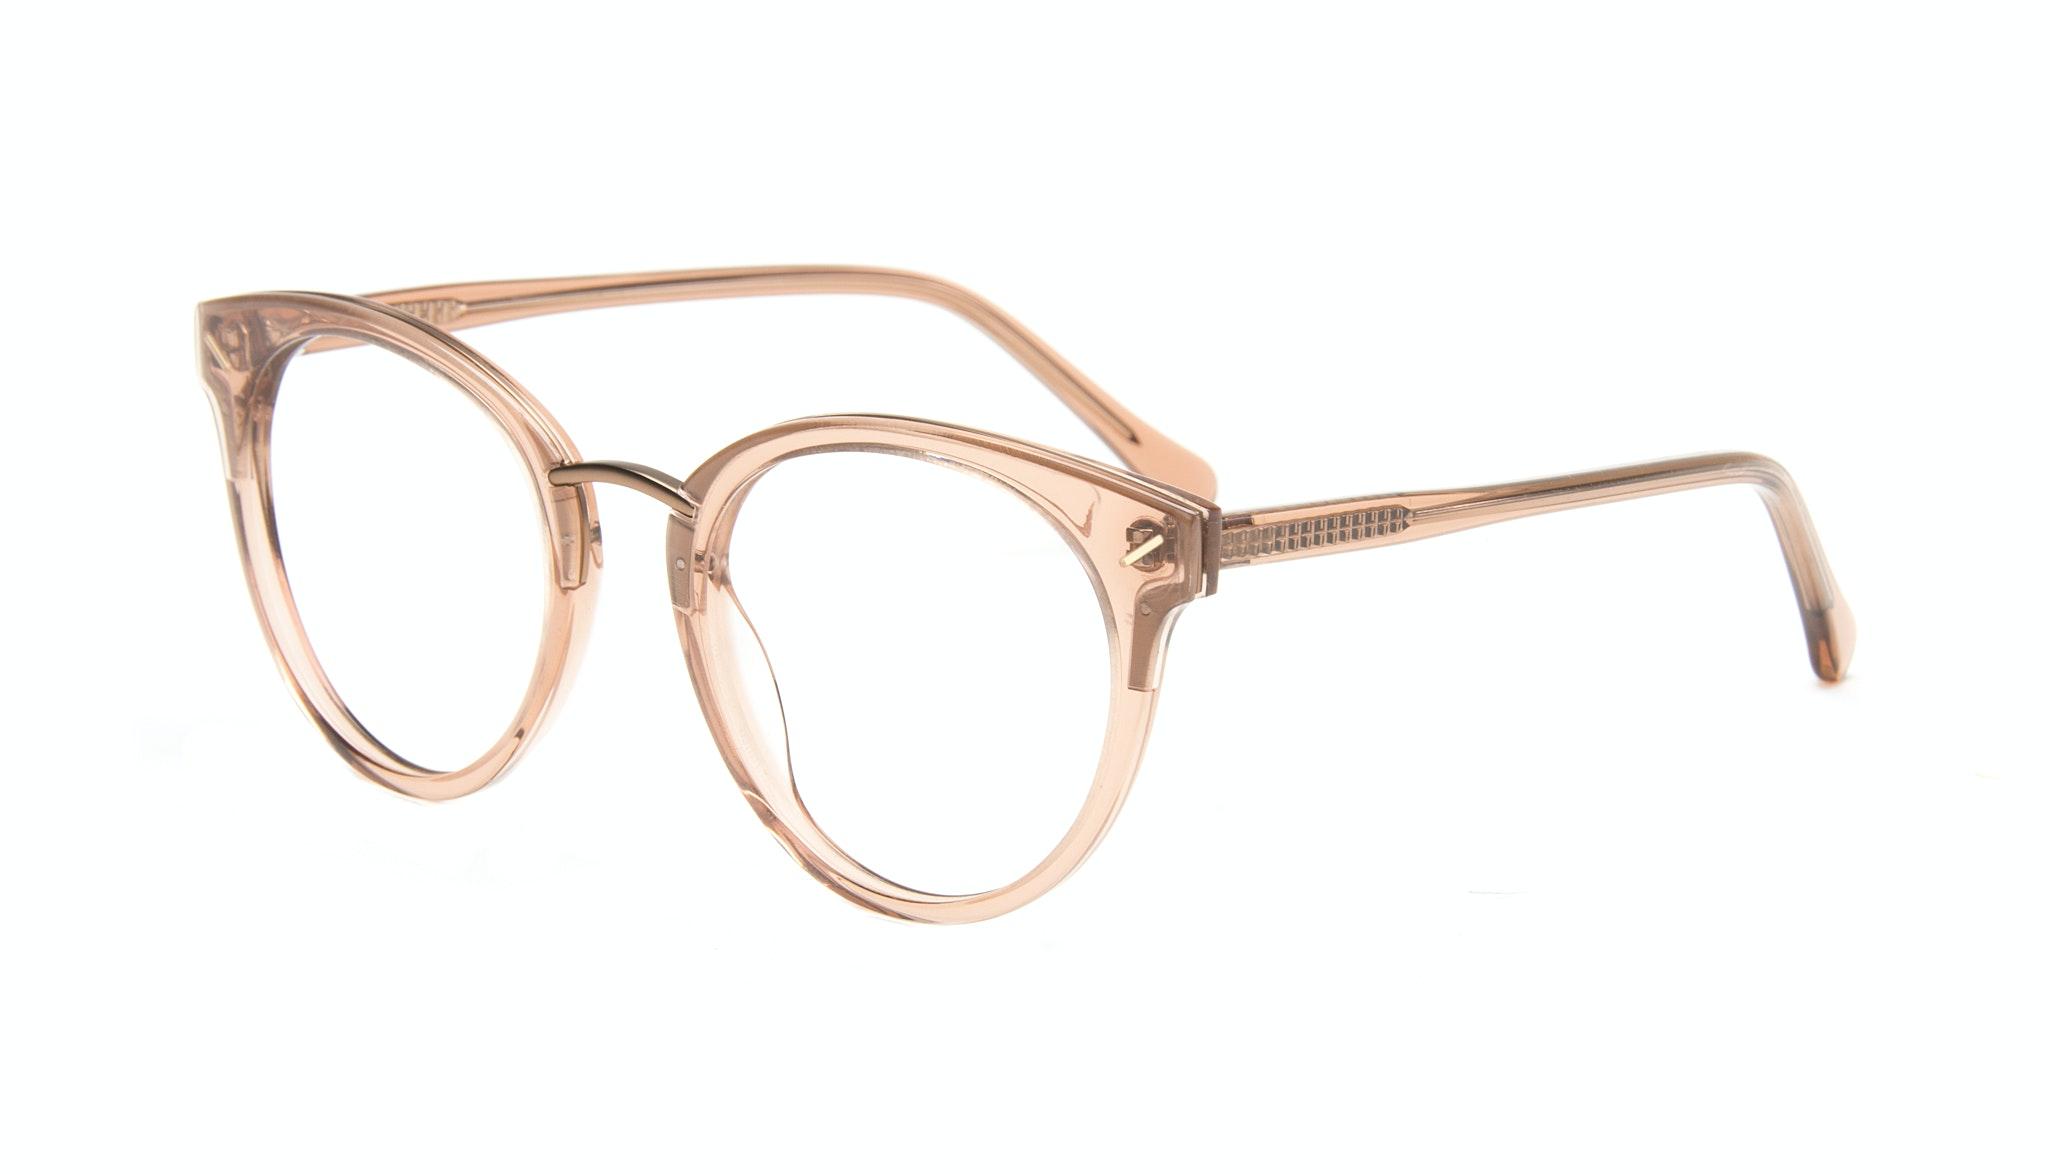 Affordable Fashion Glasses Cat Eye Round Eyeglasses Women Element Rose Tilt